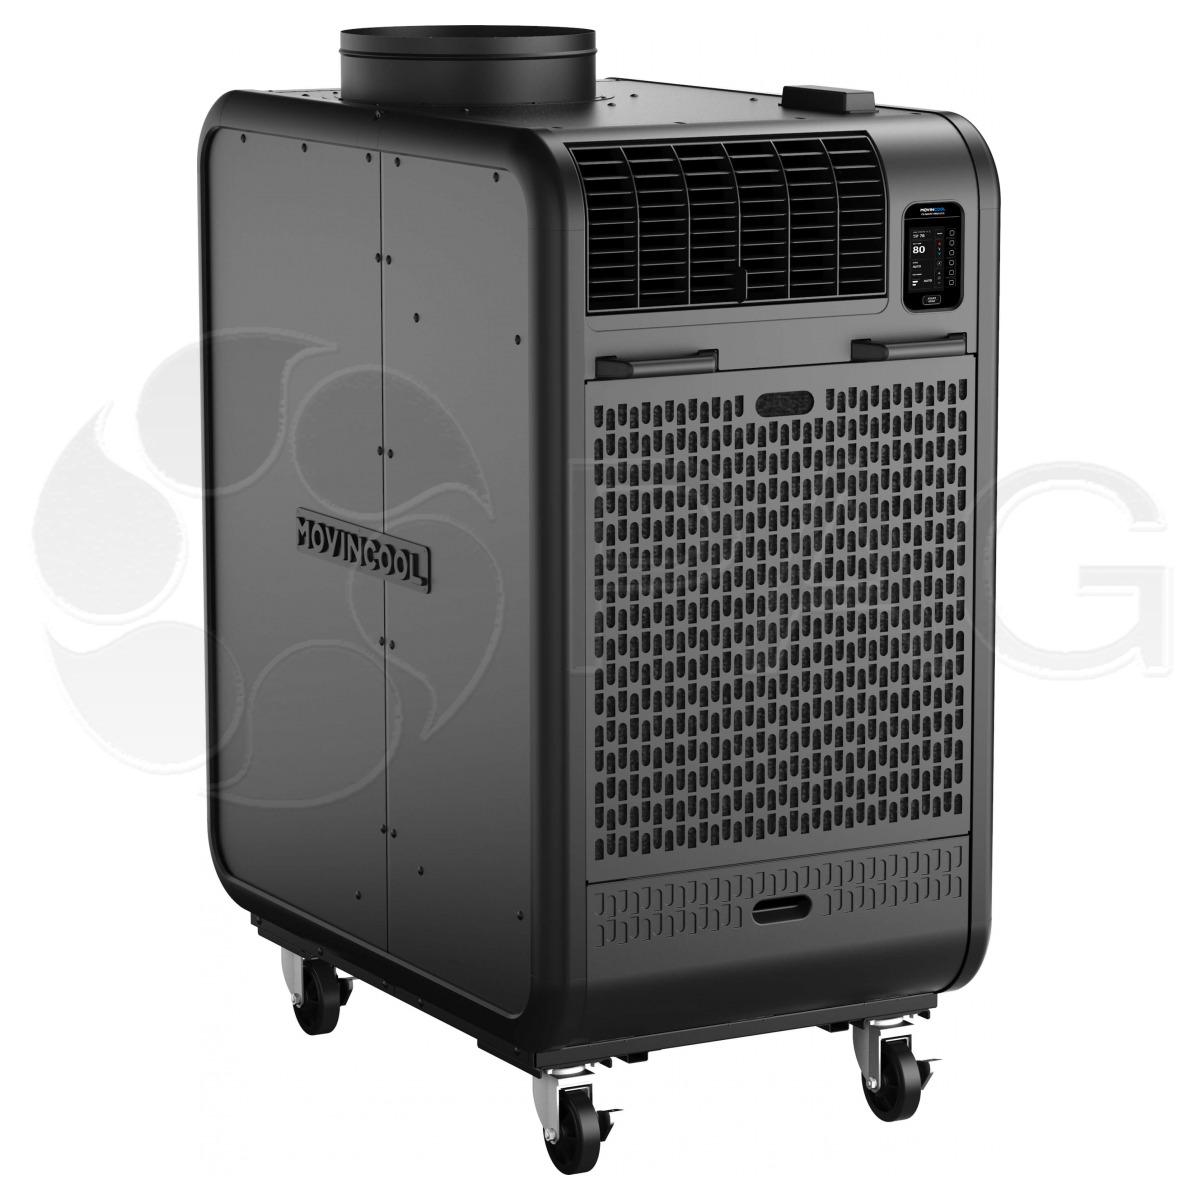 MovinCool-Climate-Pro-K63 Portable Air Conditioner